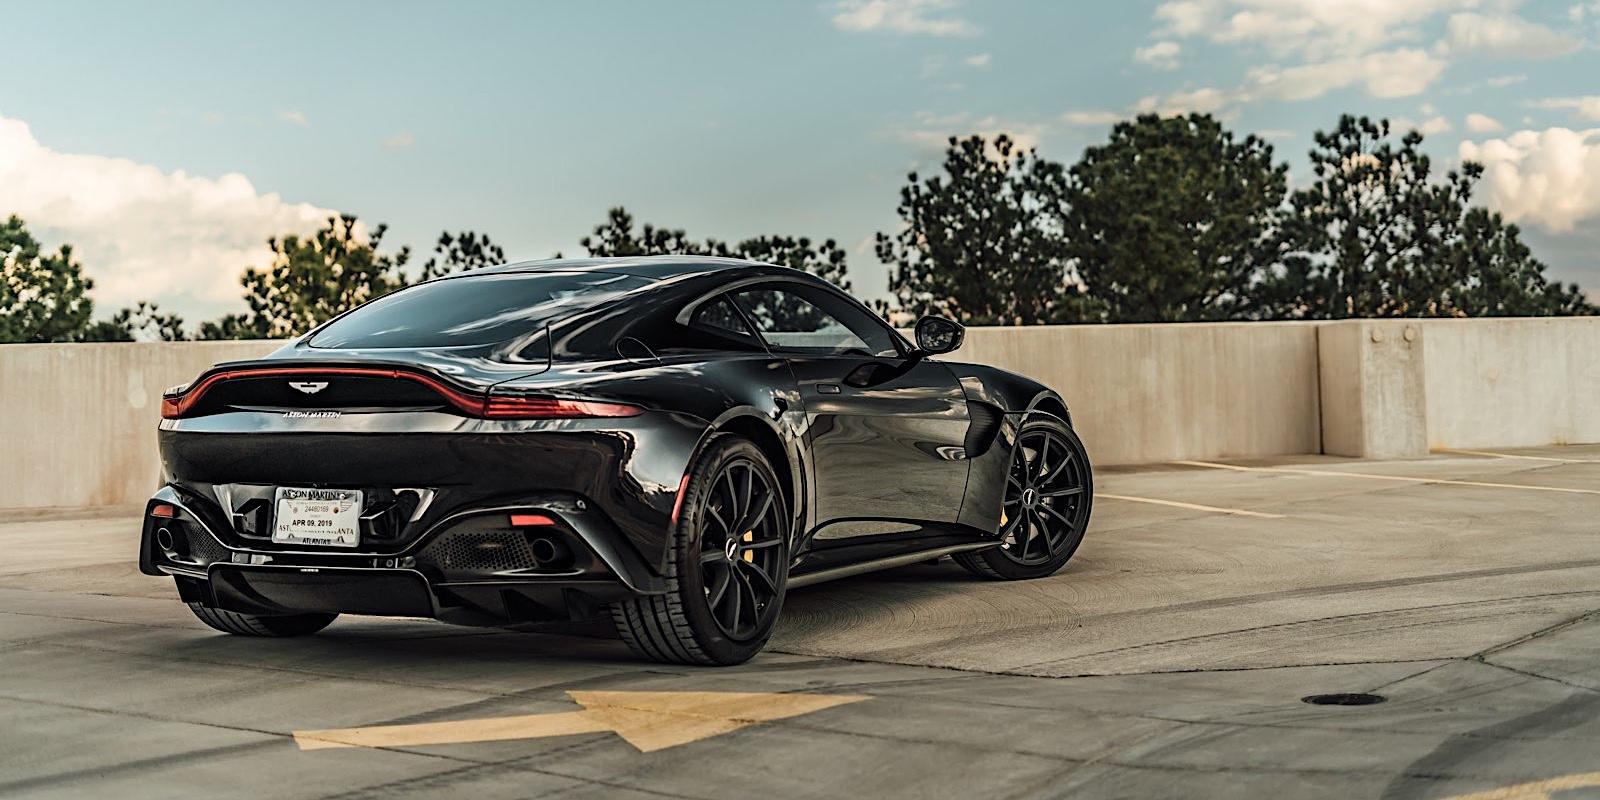 Under The Hood Of The Aston Martin Vantage Field Notes The Turo Blog